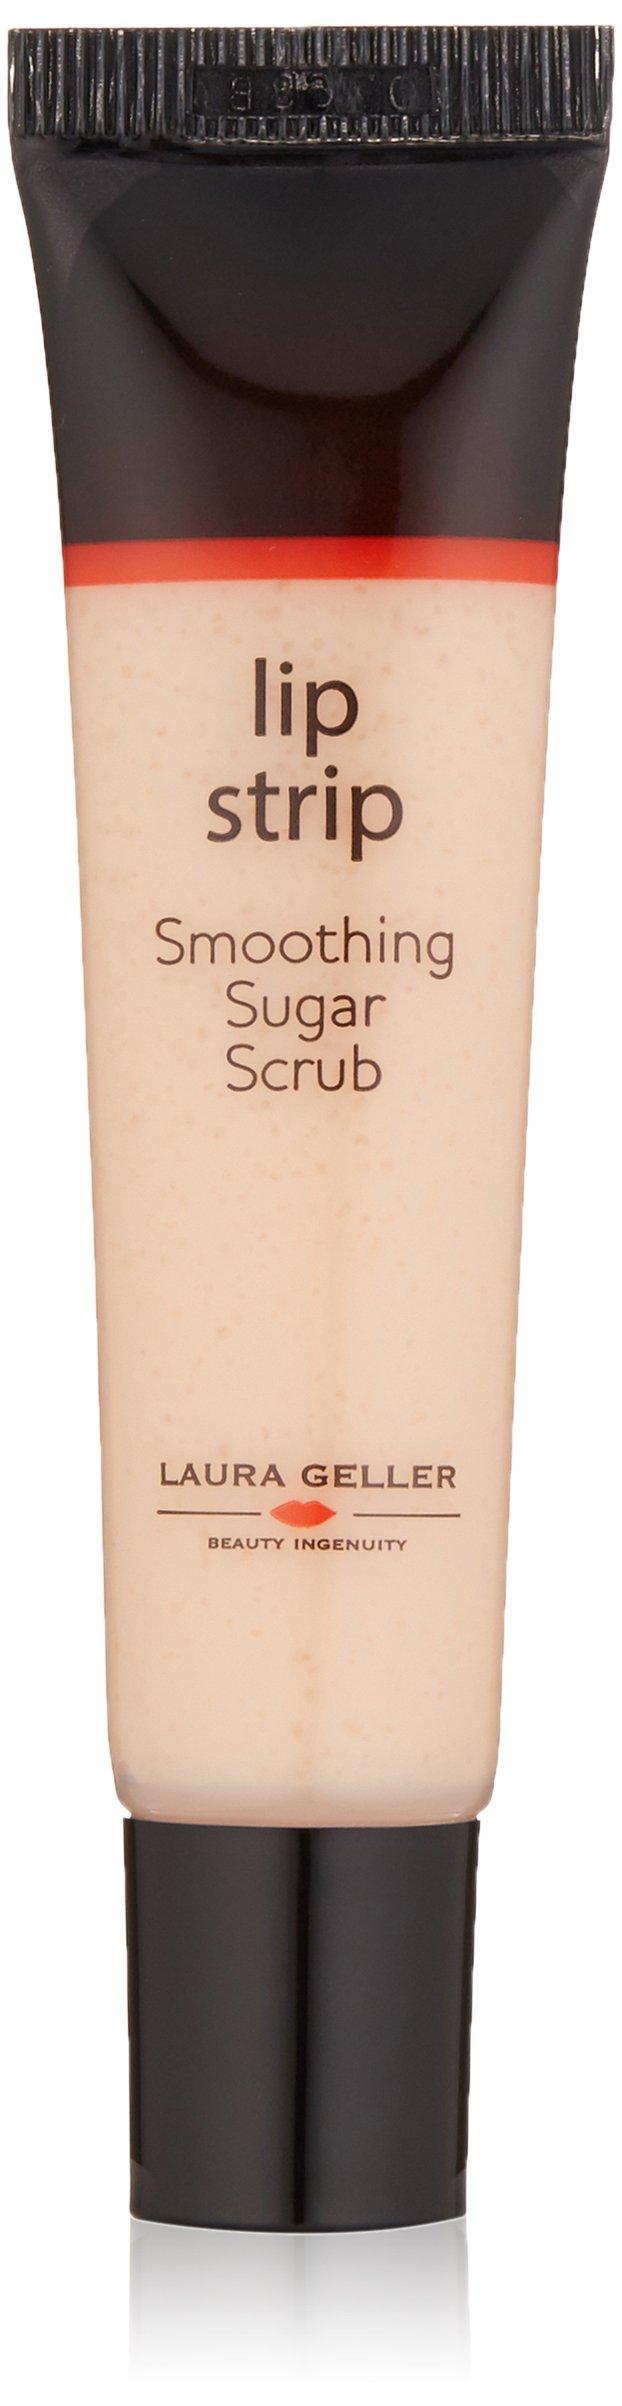 Laura Geller New York Lip Strip Smoothing Sugar Scrub